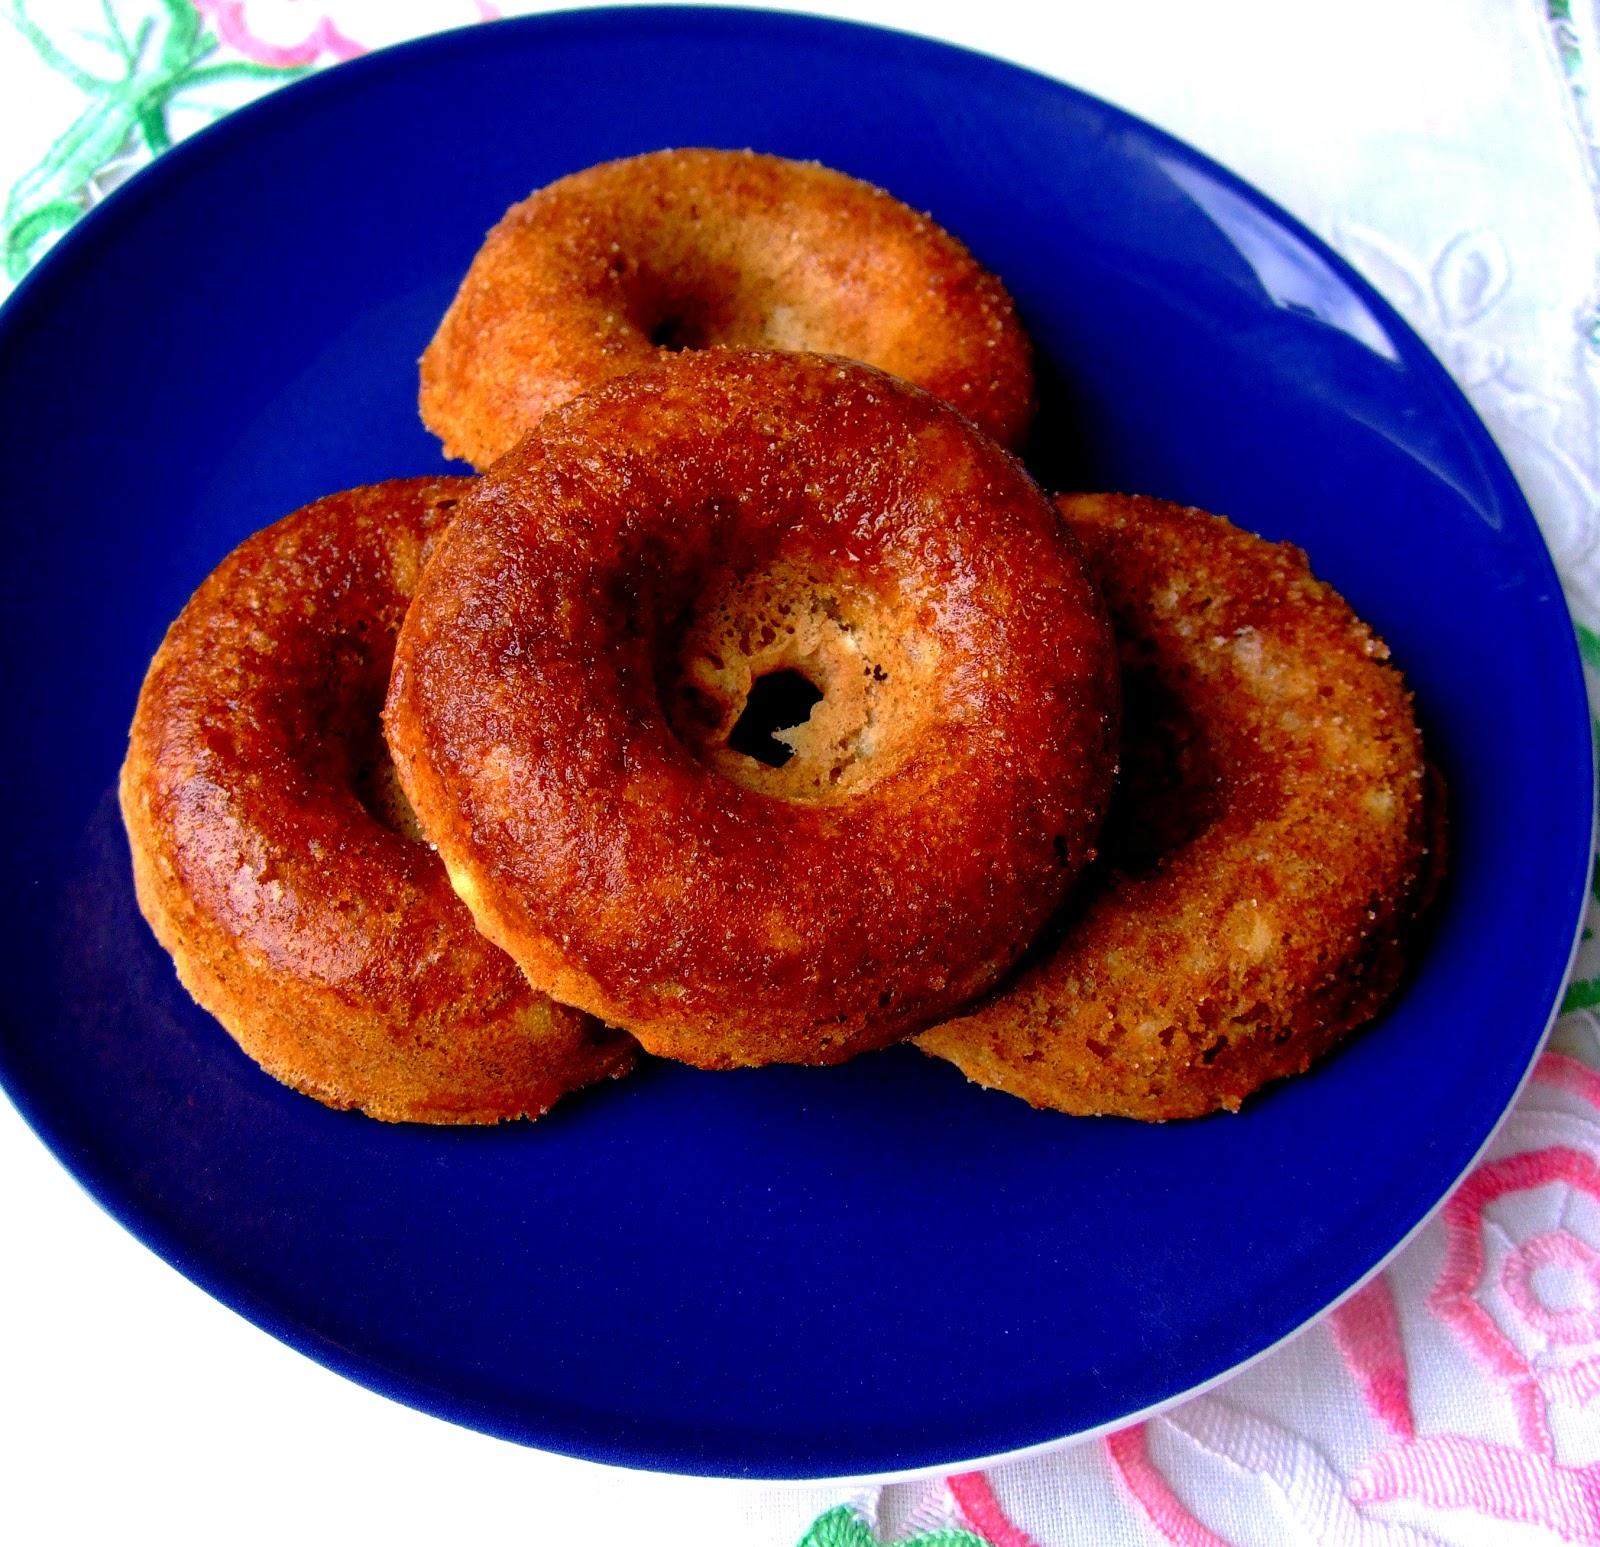 Gluten Free Baked Banana Doughnuts - Kat Cupcake